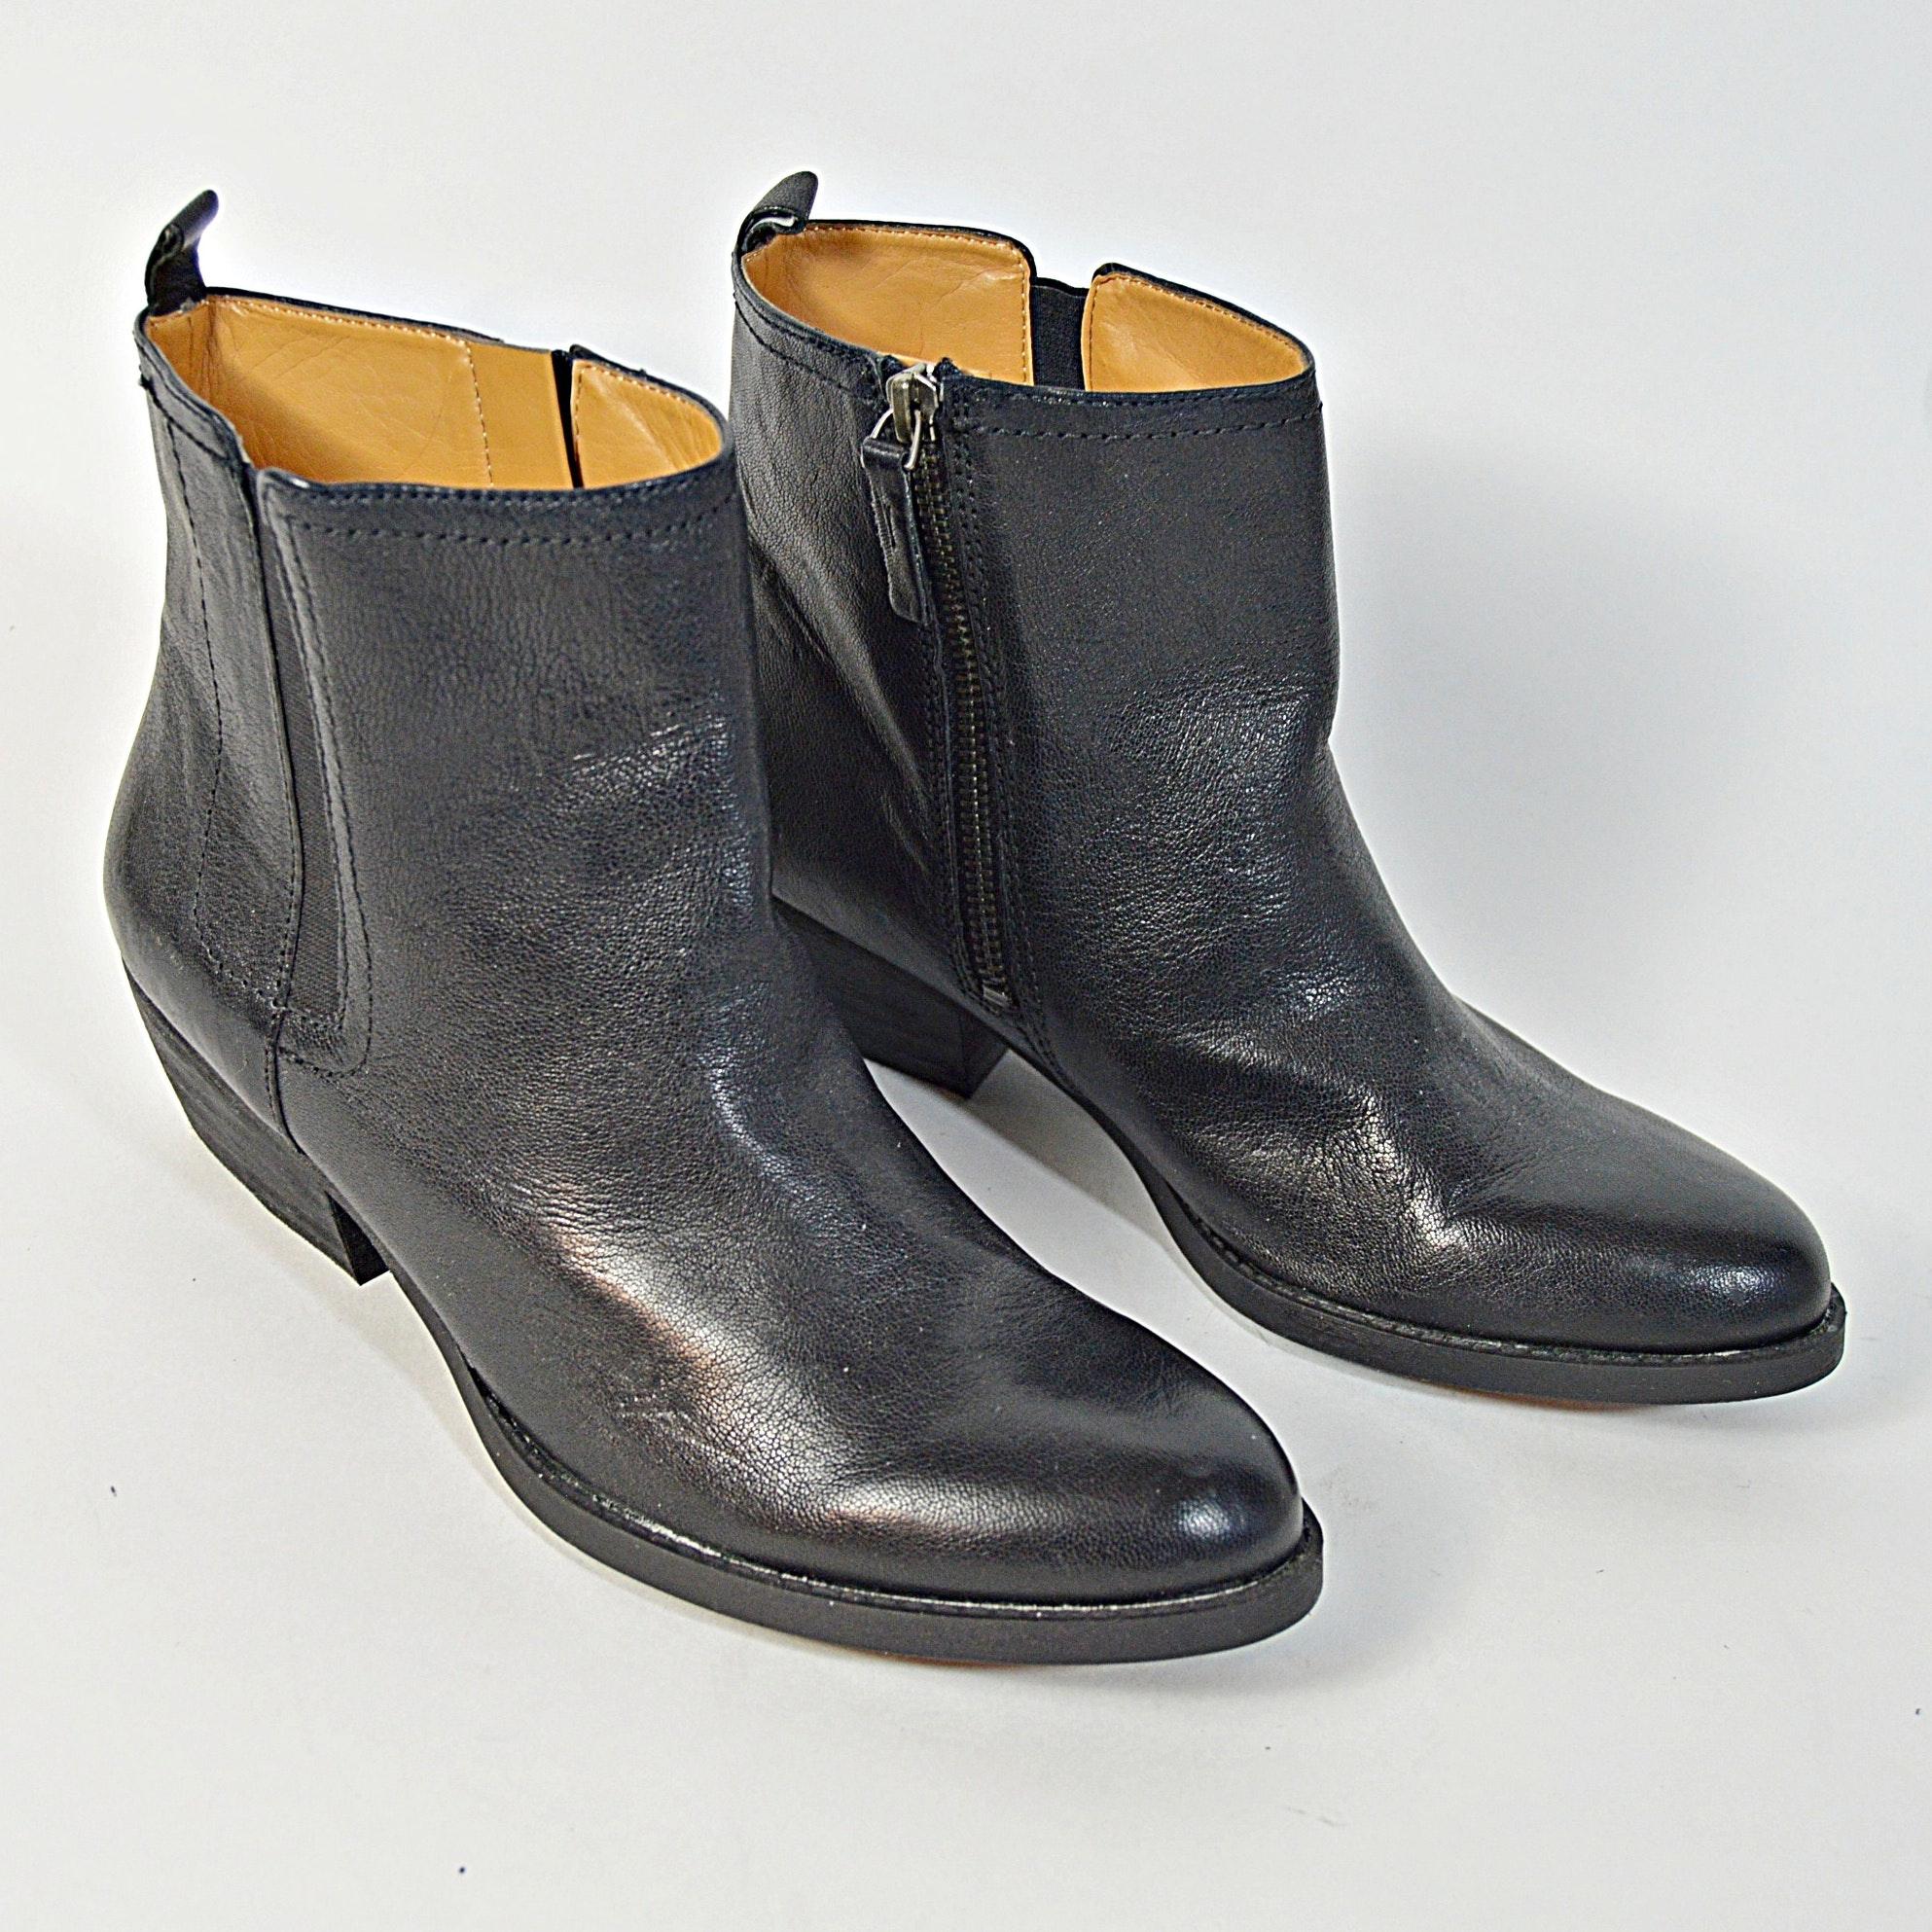 Nine West Black Leather Boots, 8.5M